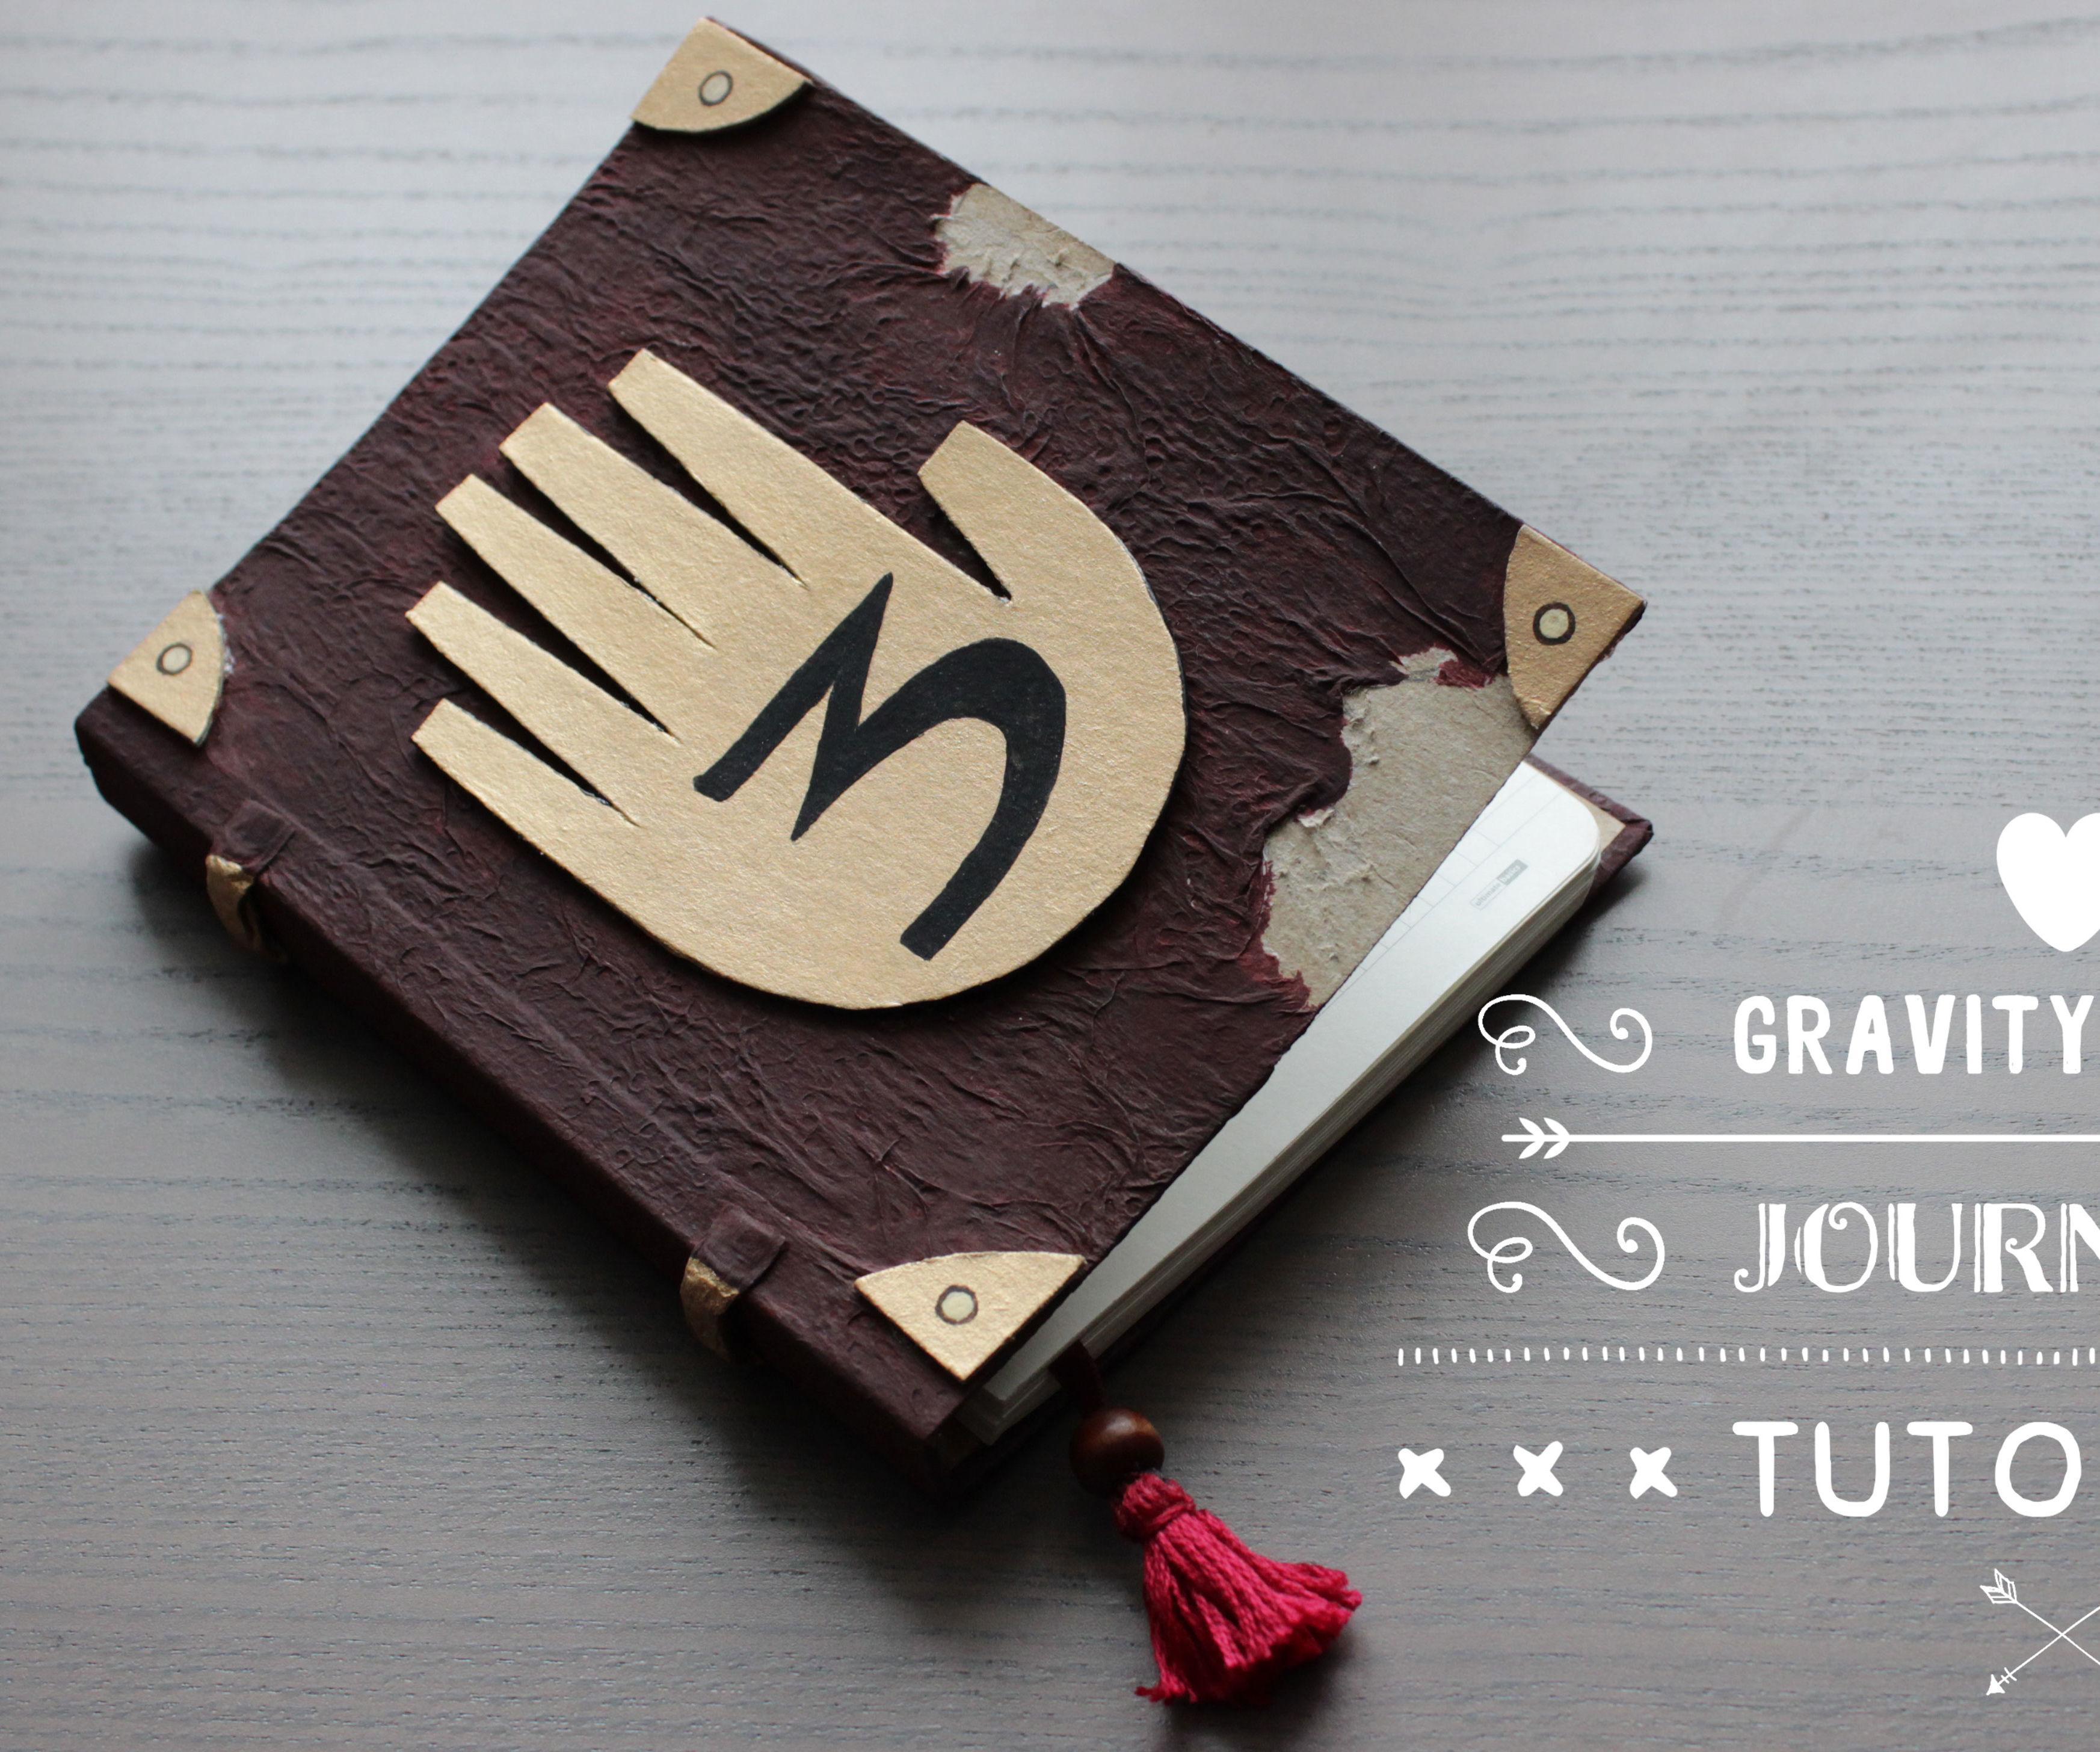 Gravity Falls Journal 3 Tutorial